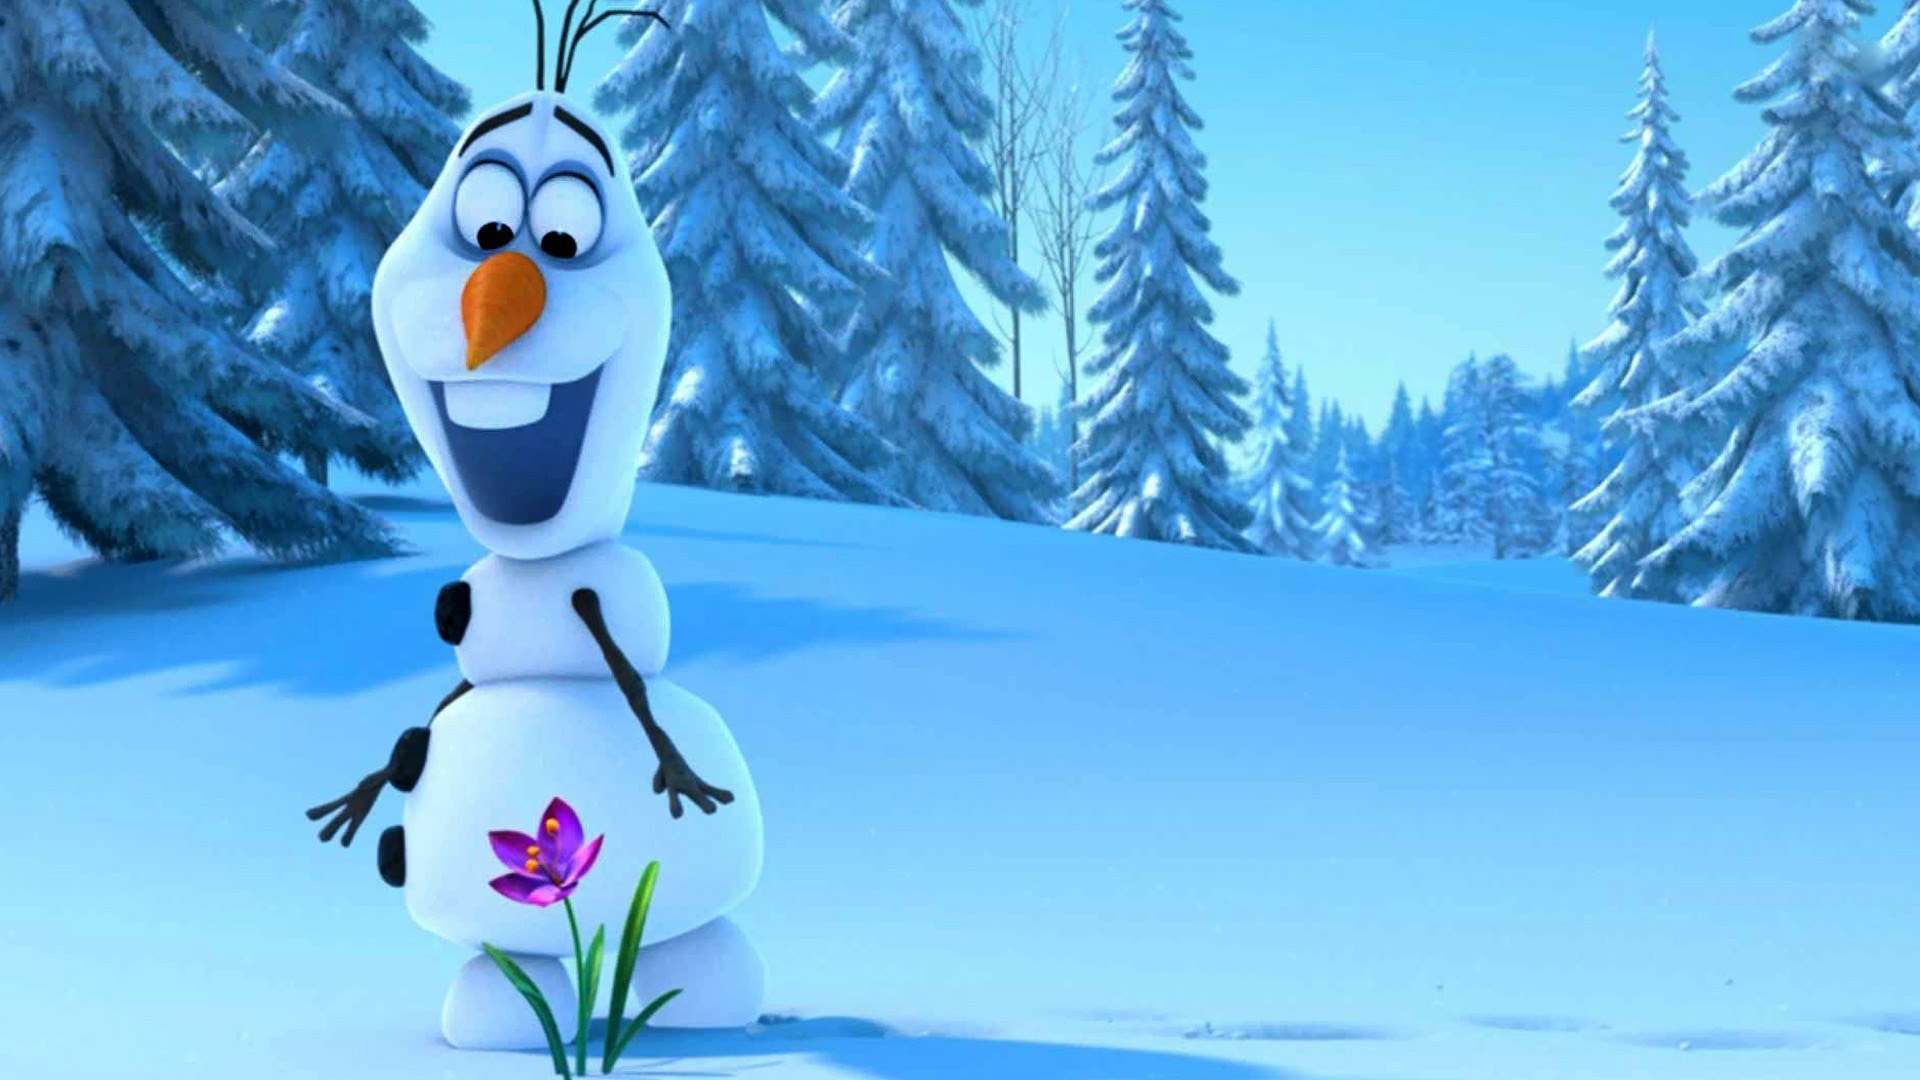 Olaf Frozen HD 1080p Wallpaper 1920 x 1080 : wallpapers